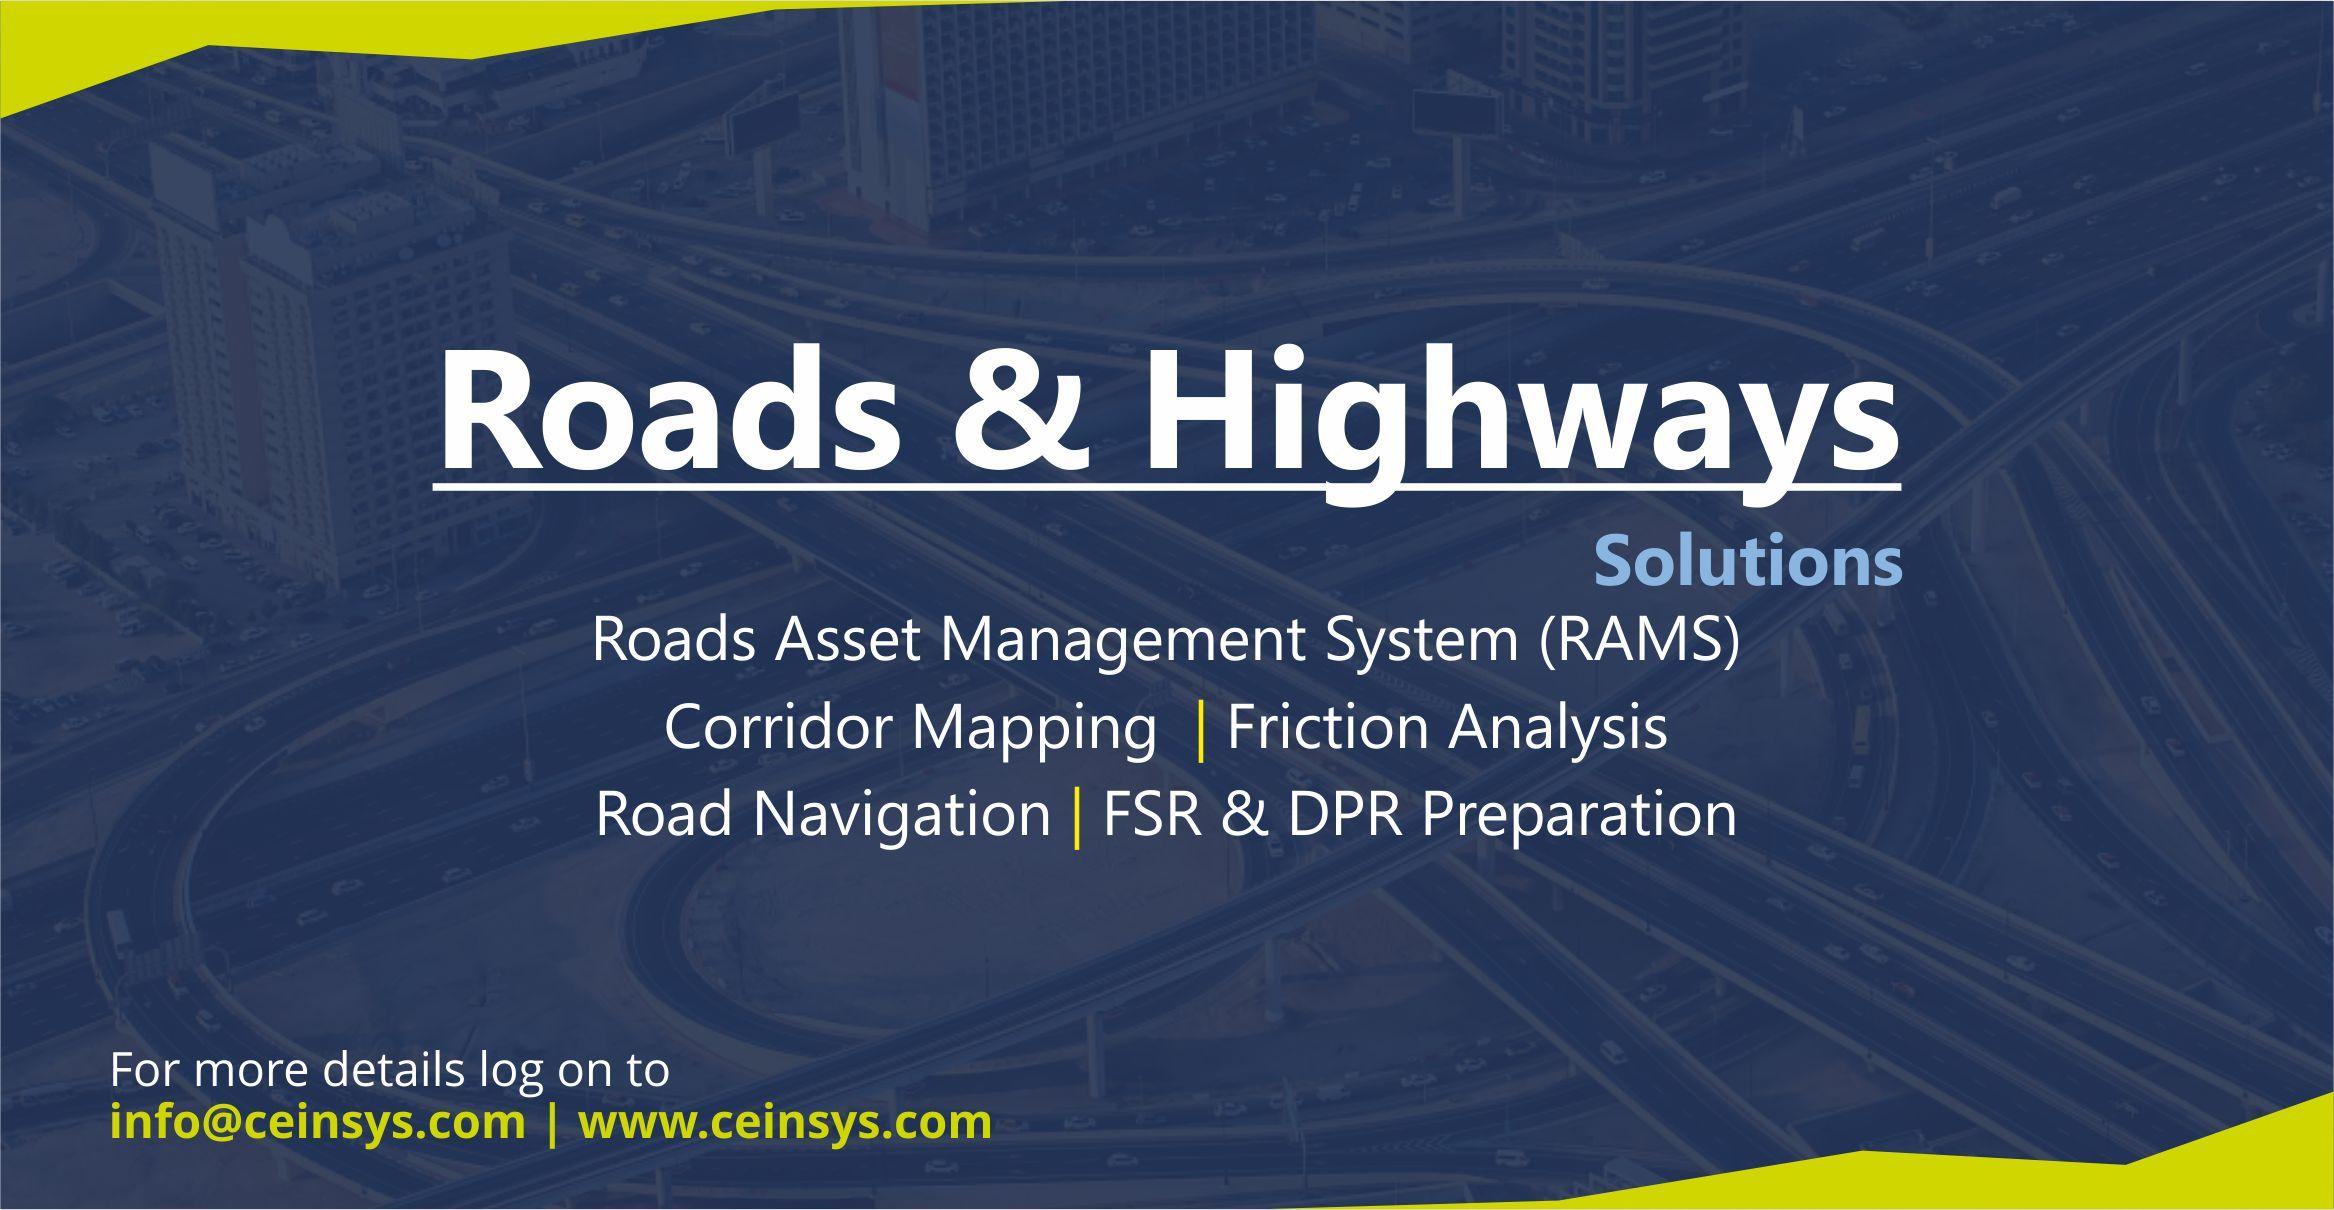 Roads Highways Roads Asset Management System Corridor Mapping Friction Analysis Road Navigation Dpr Fsr Pre Infrastructure Asset Management Solutions